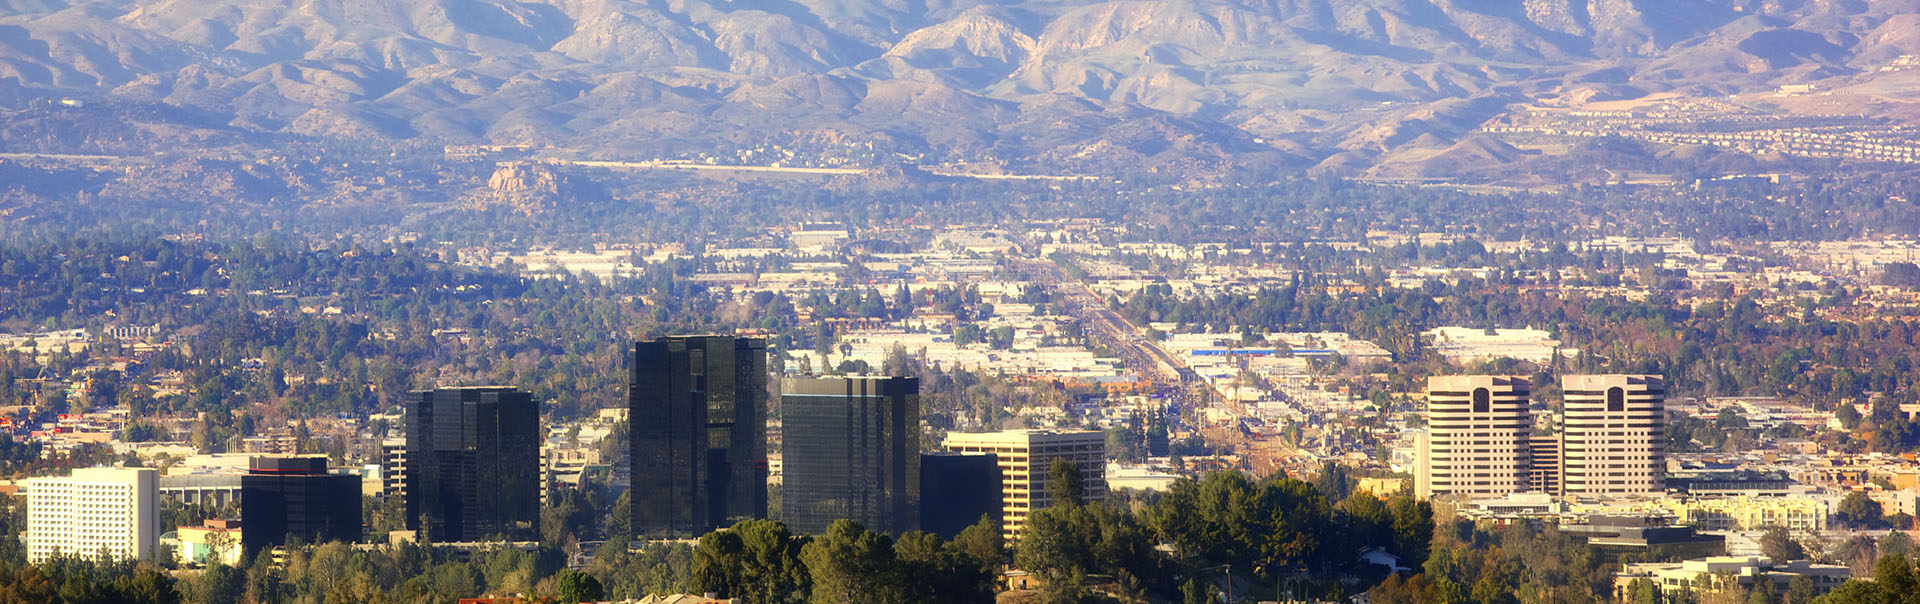 Woodland Hills Website Design Los Angeles